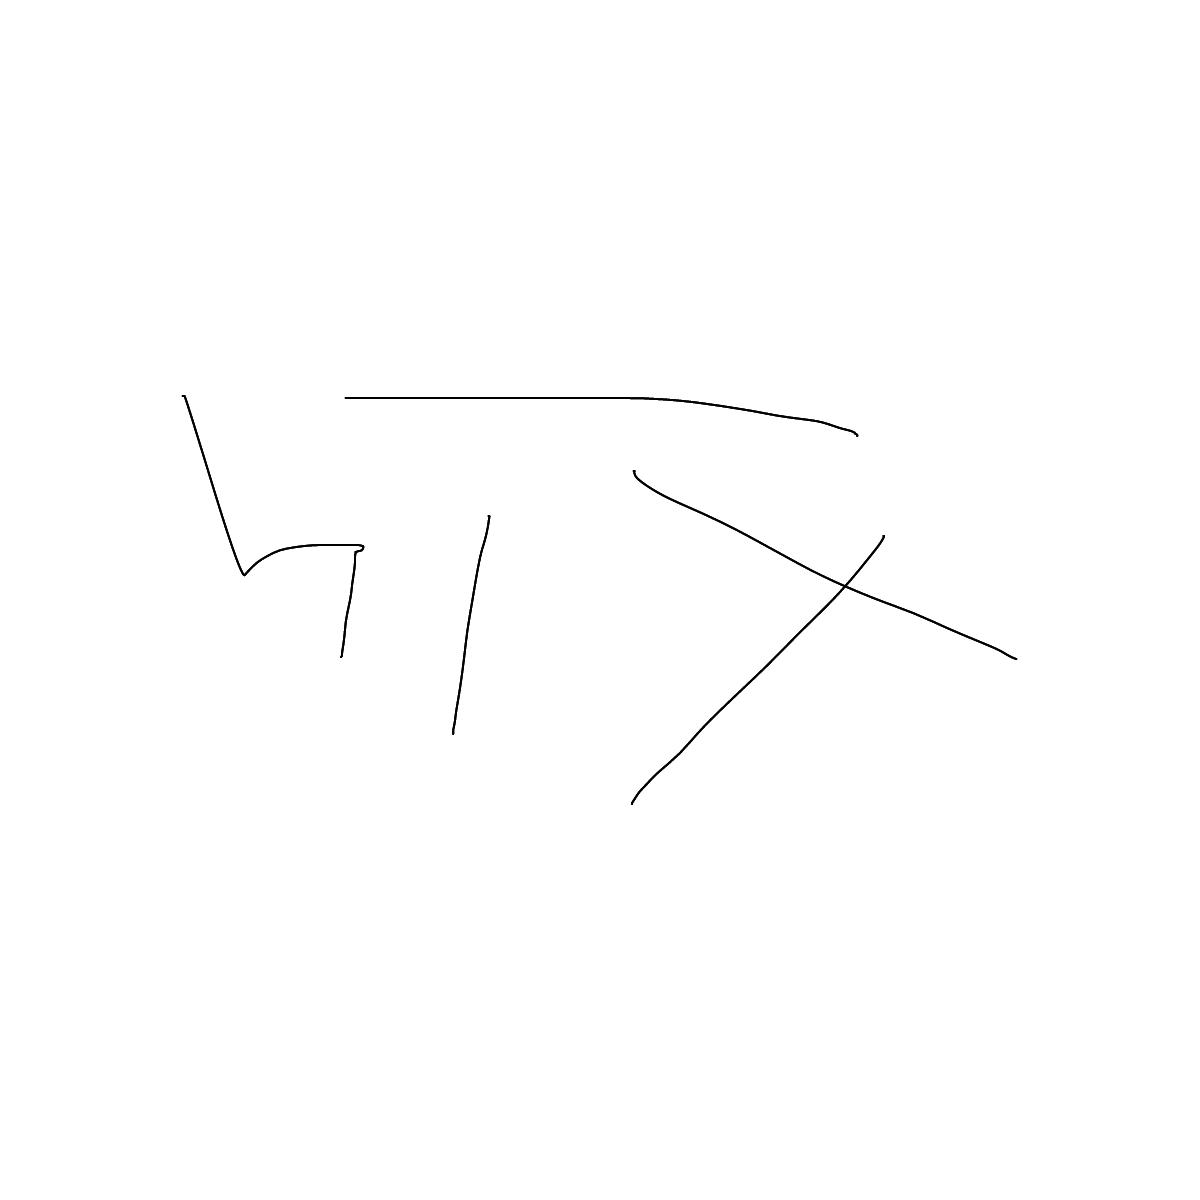 BAAAM drawing#1524 lat:55.9353866577148440lng: -3.2020332813262940